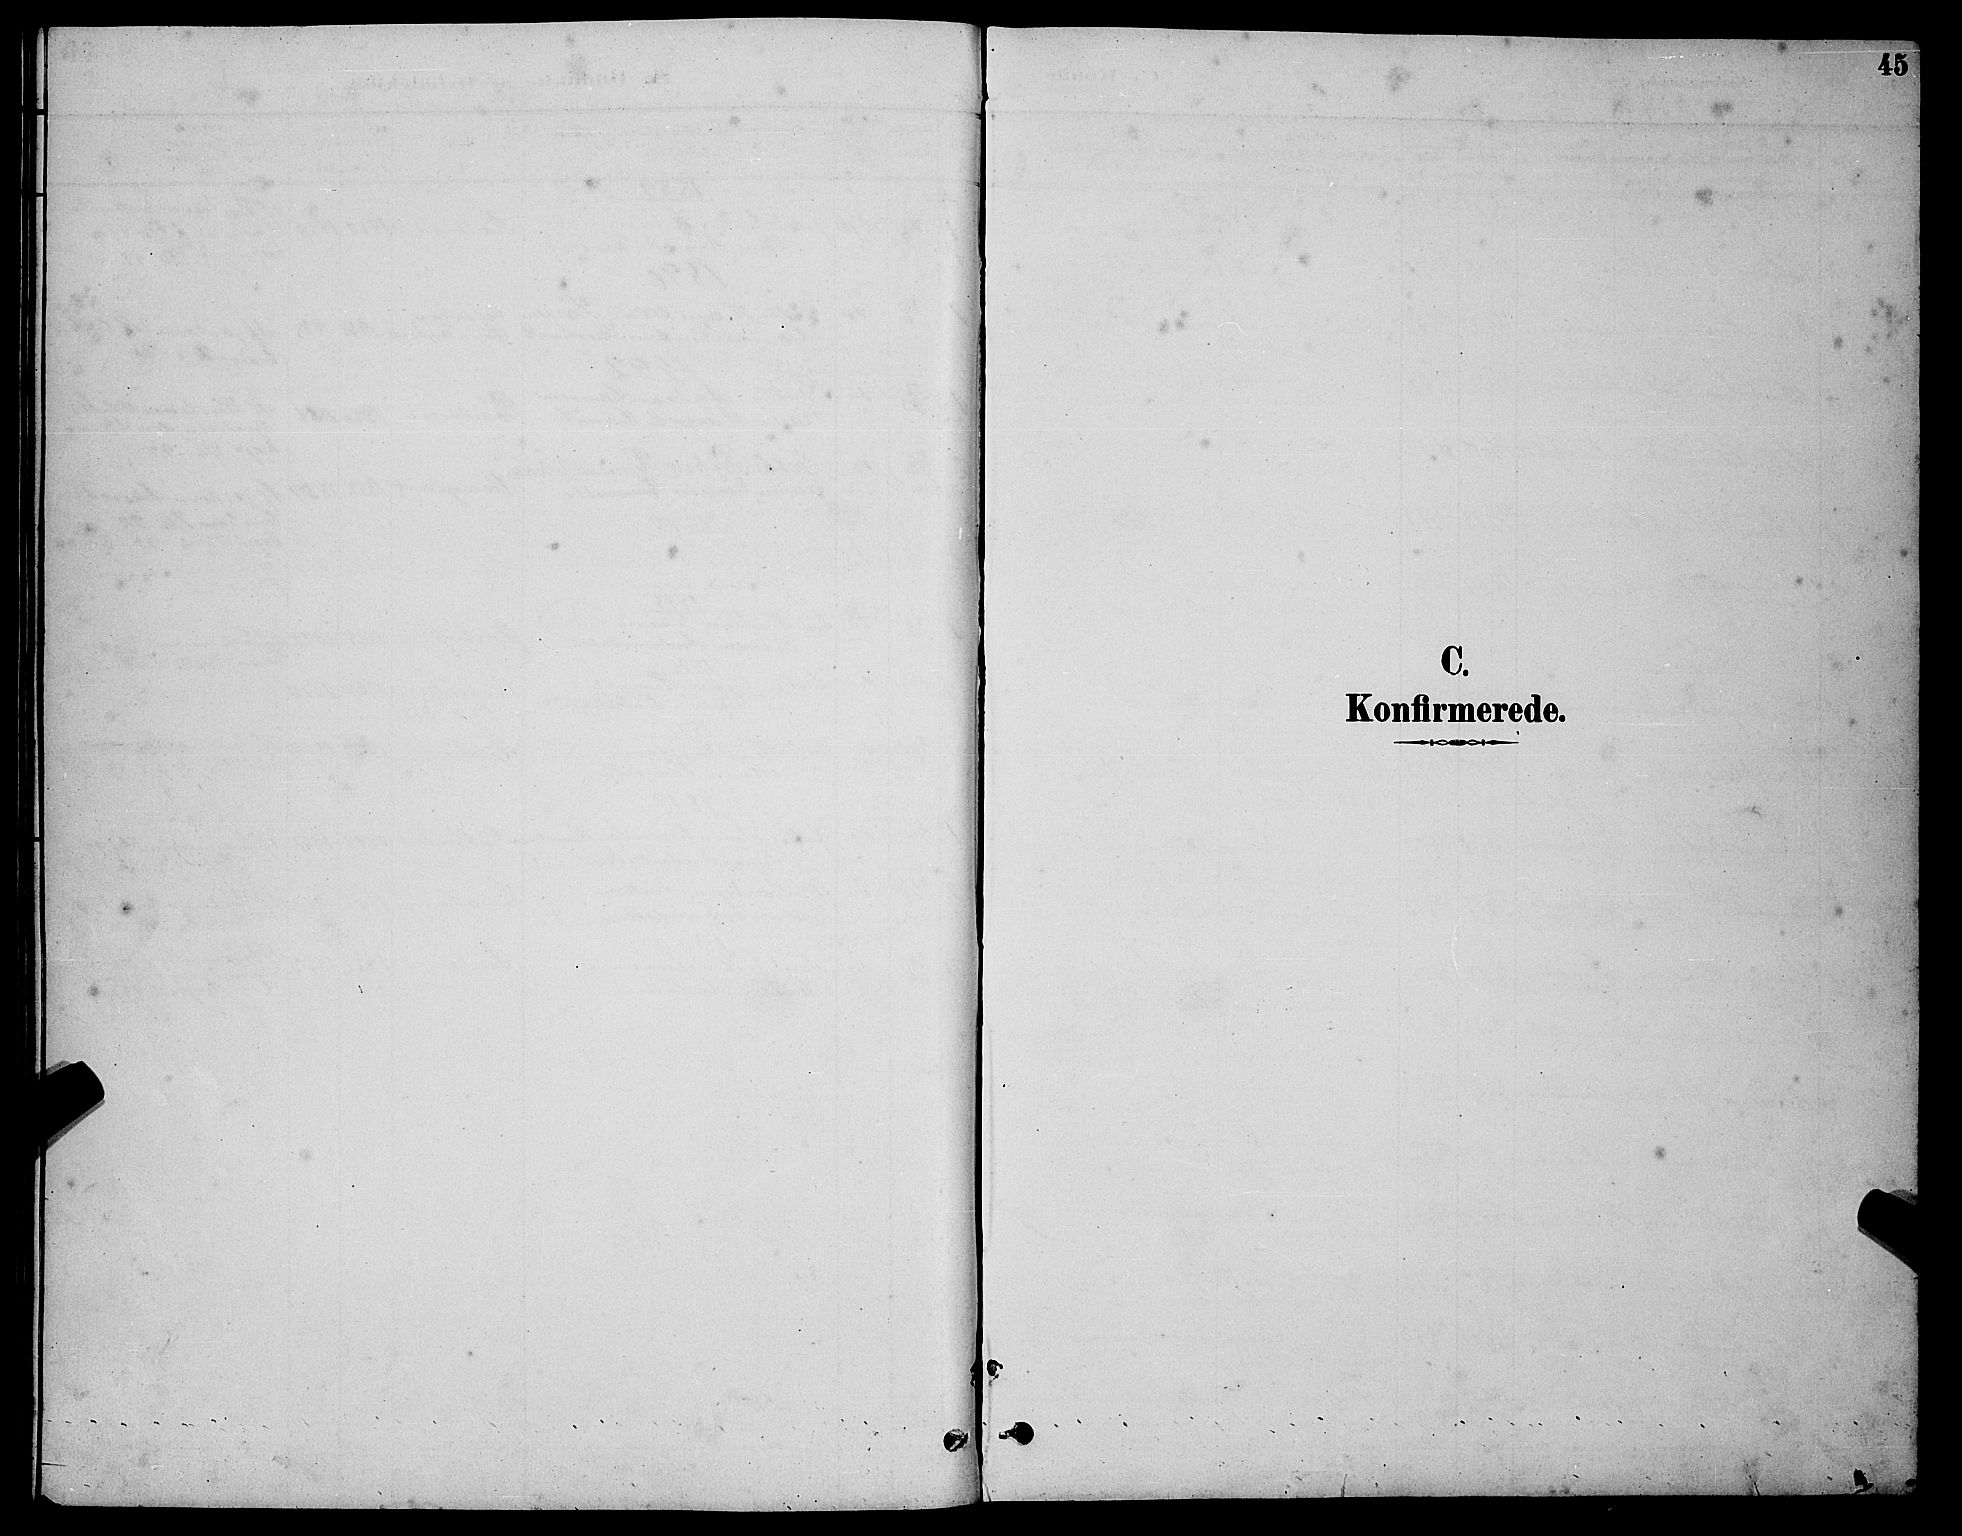 SATØ, Tranøy sokneprestkontor, I/Ia/Iab/L0004klokker: Parish register (copy) no. 4, 1888-1901, p. 45